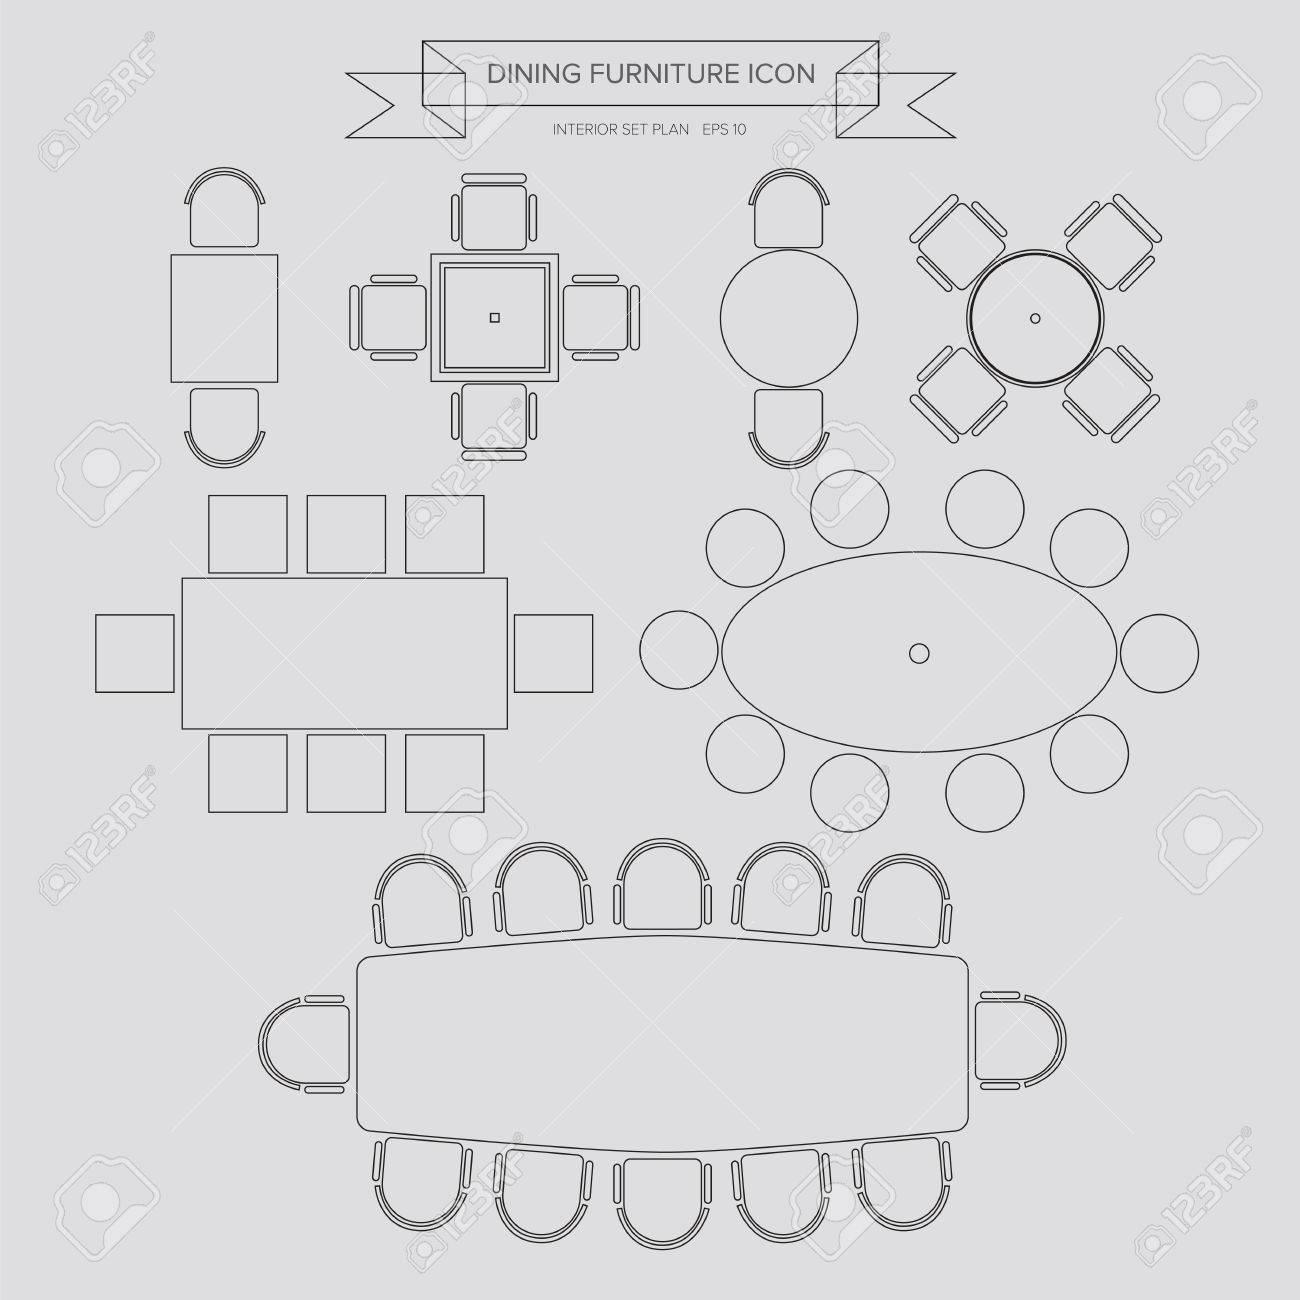 Wondrous Dinning Furniture Outline Icon Top View For Interior Plan Creativecarmelina Interior Chair Design Creativecarmelinacom